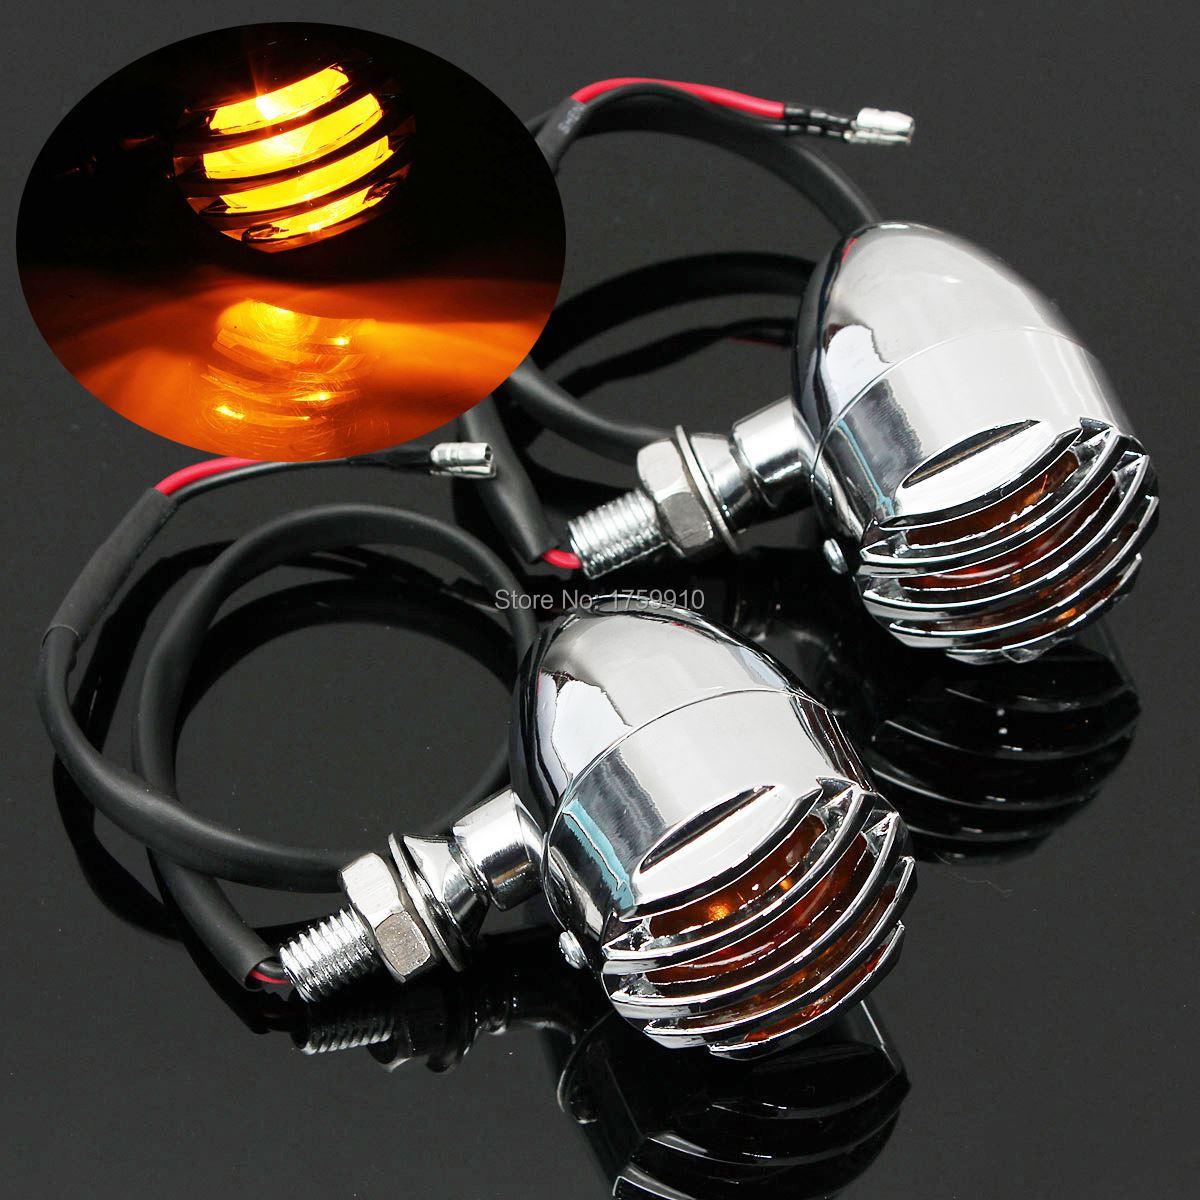 2x 12V Chrome Motorcycle Turn Signal Indicator Lights Blinker Lamp For Harley For Honda Amber For Suzuki For Yamaha 5W<br><br>Aliexpress